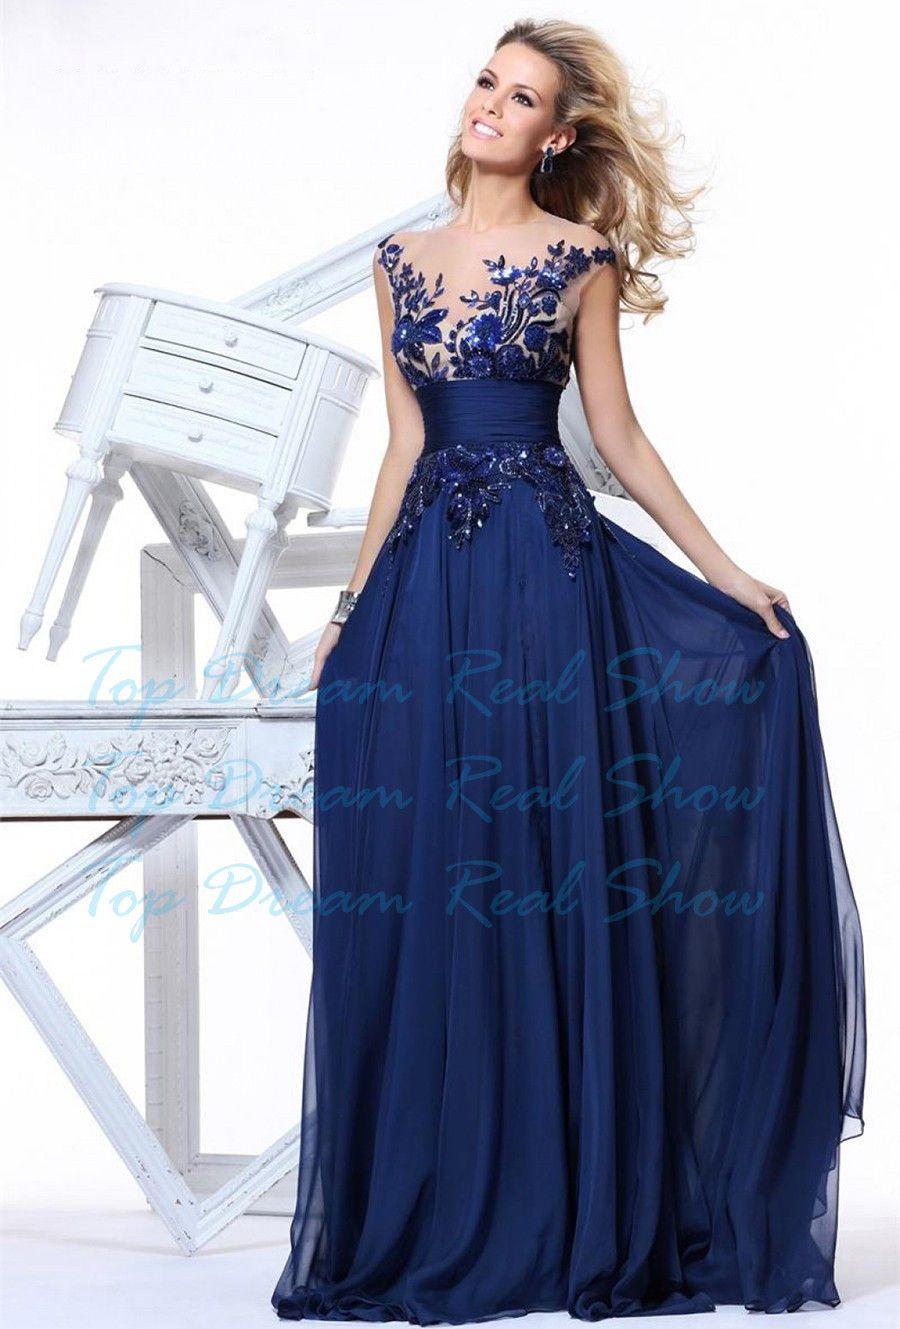 esVestidos Dresses Encontró Prom Se En Google Desde Asemic QrsdhCtx